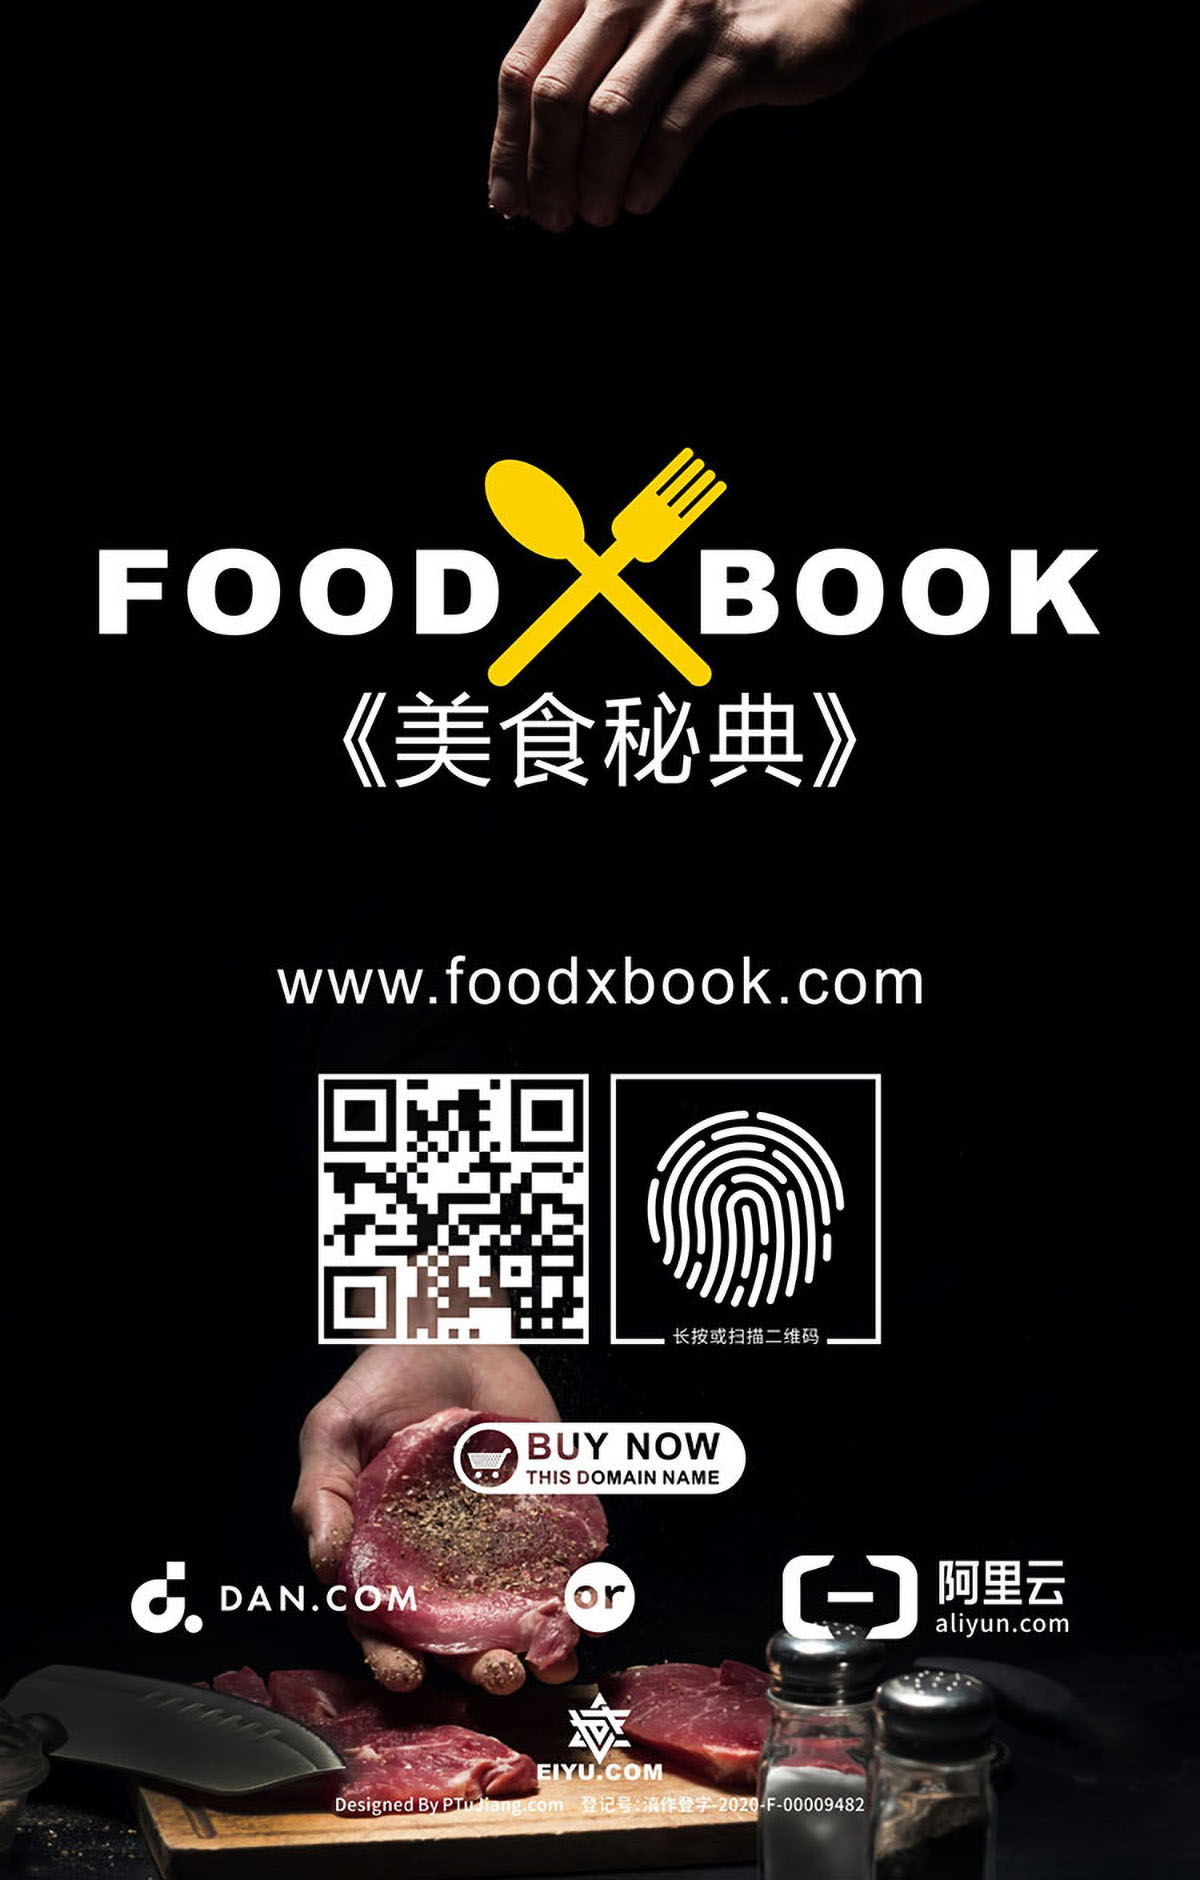 非编习作《美食秘典》foodxbook.com